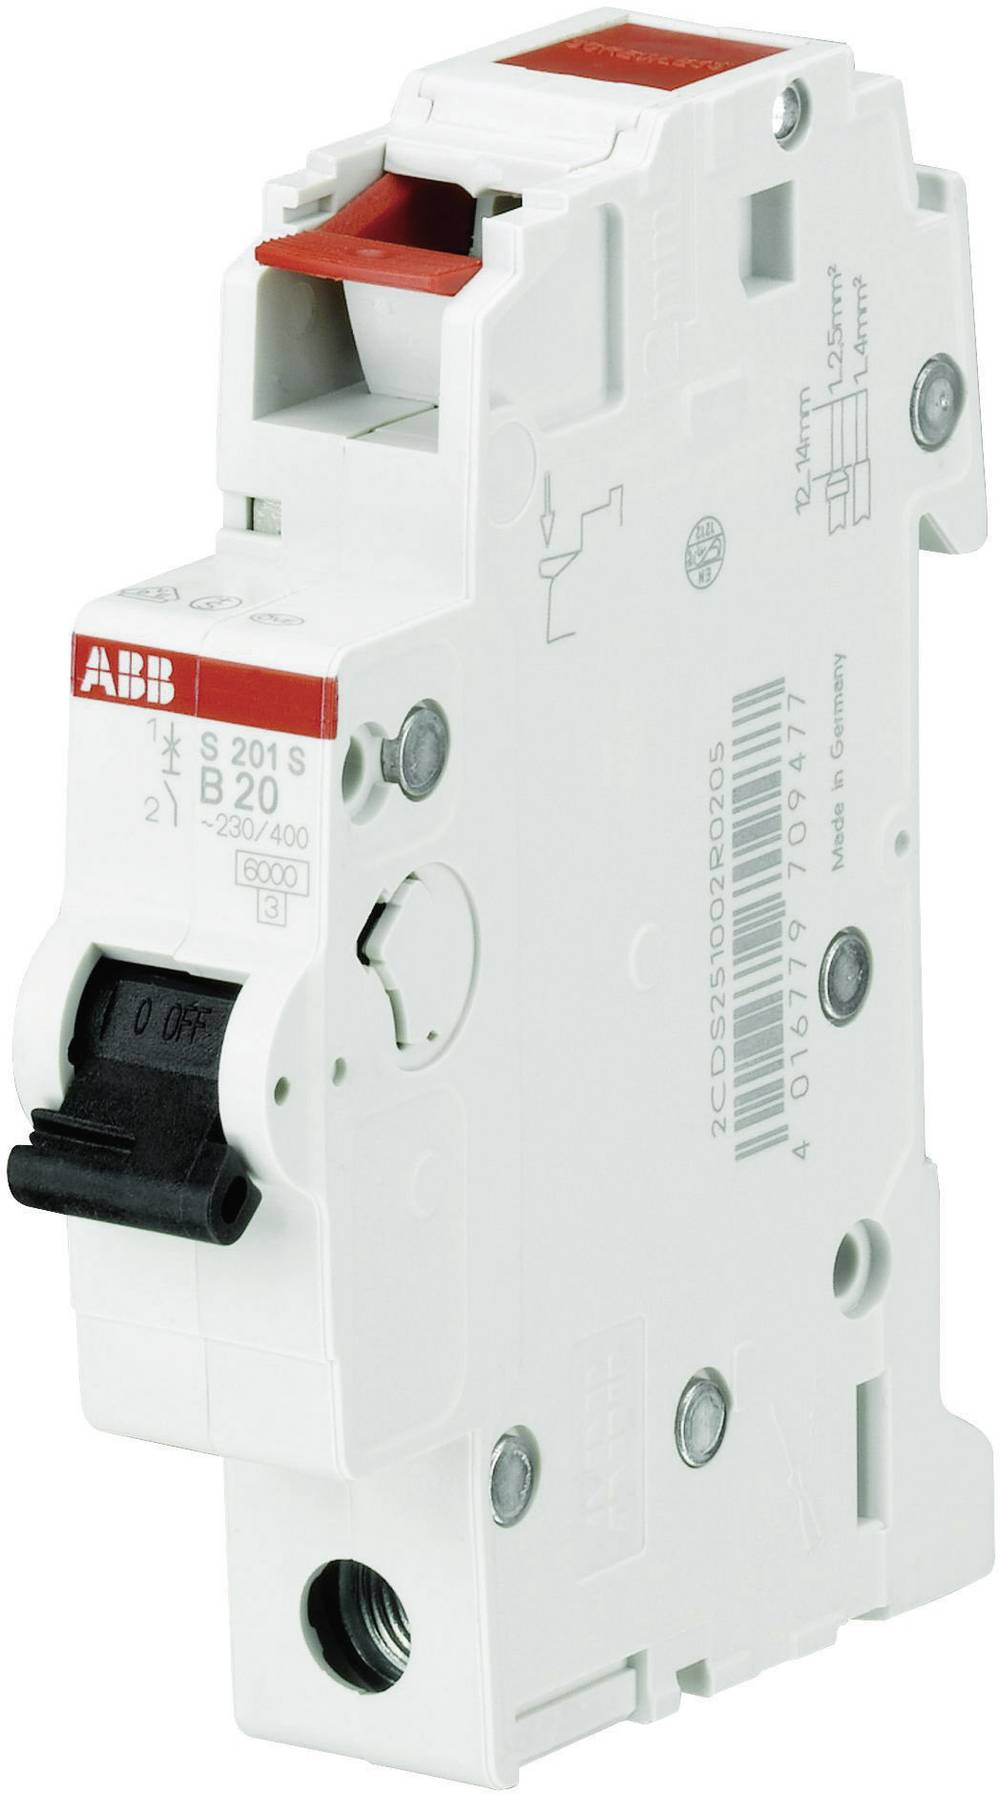 Inštalacijski odklopnik 1-polni 6 A ABB 2CDS251002R0064